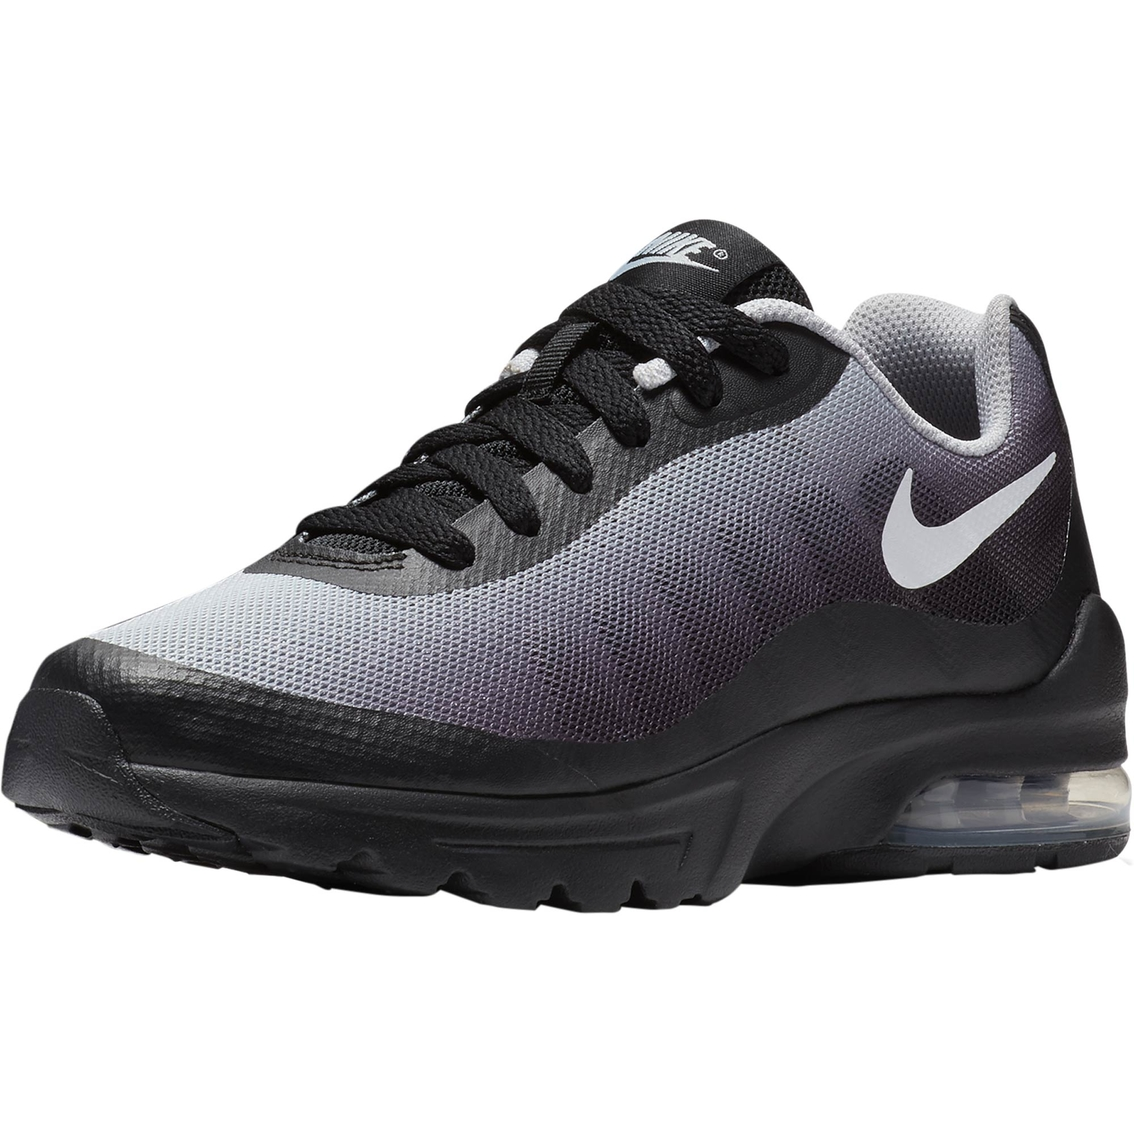 7ab0a1d87b0 Nike Grade School Boys Air Max Invigor Print Running Shoes ...